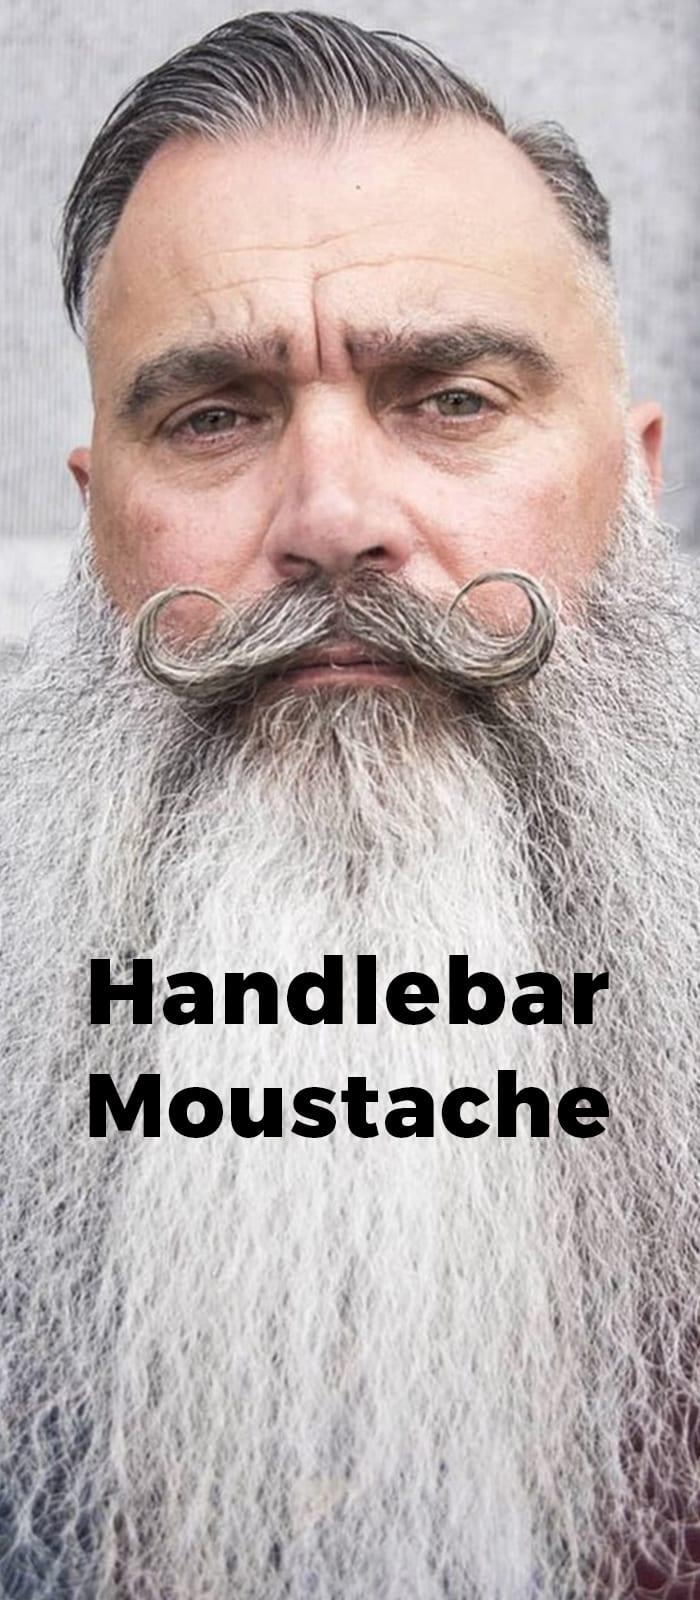 Handlebar Moustache.